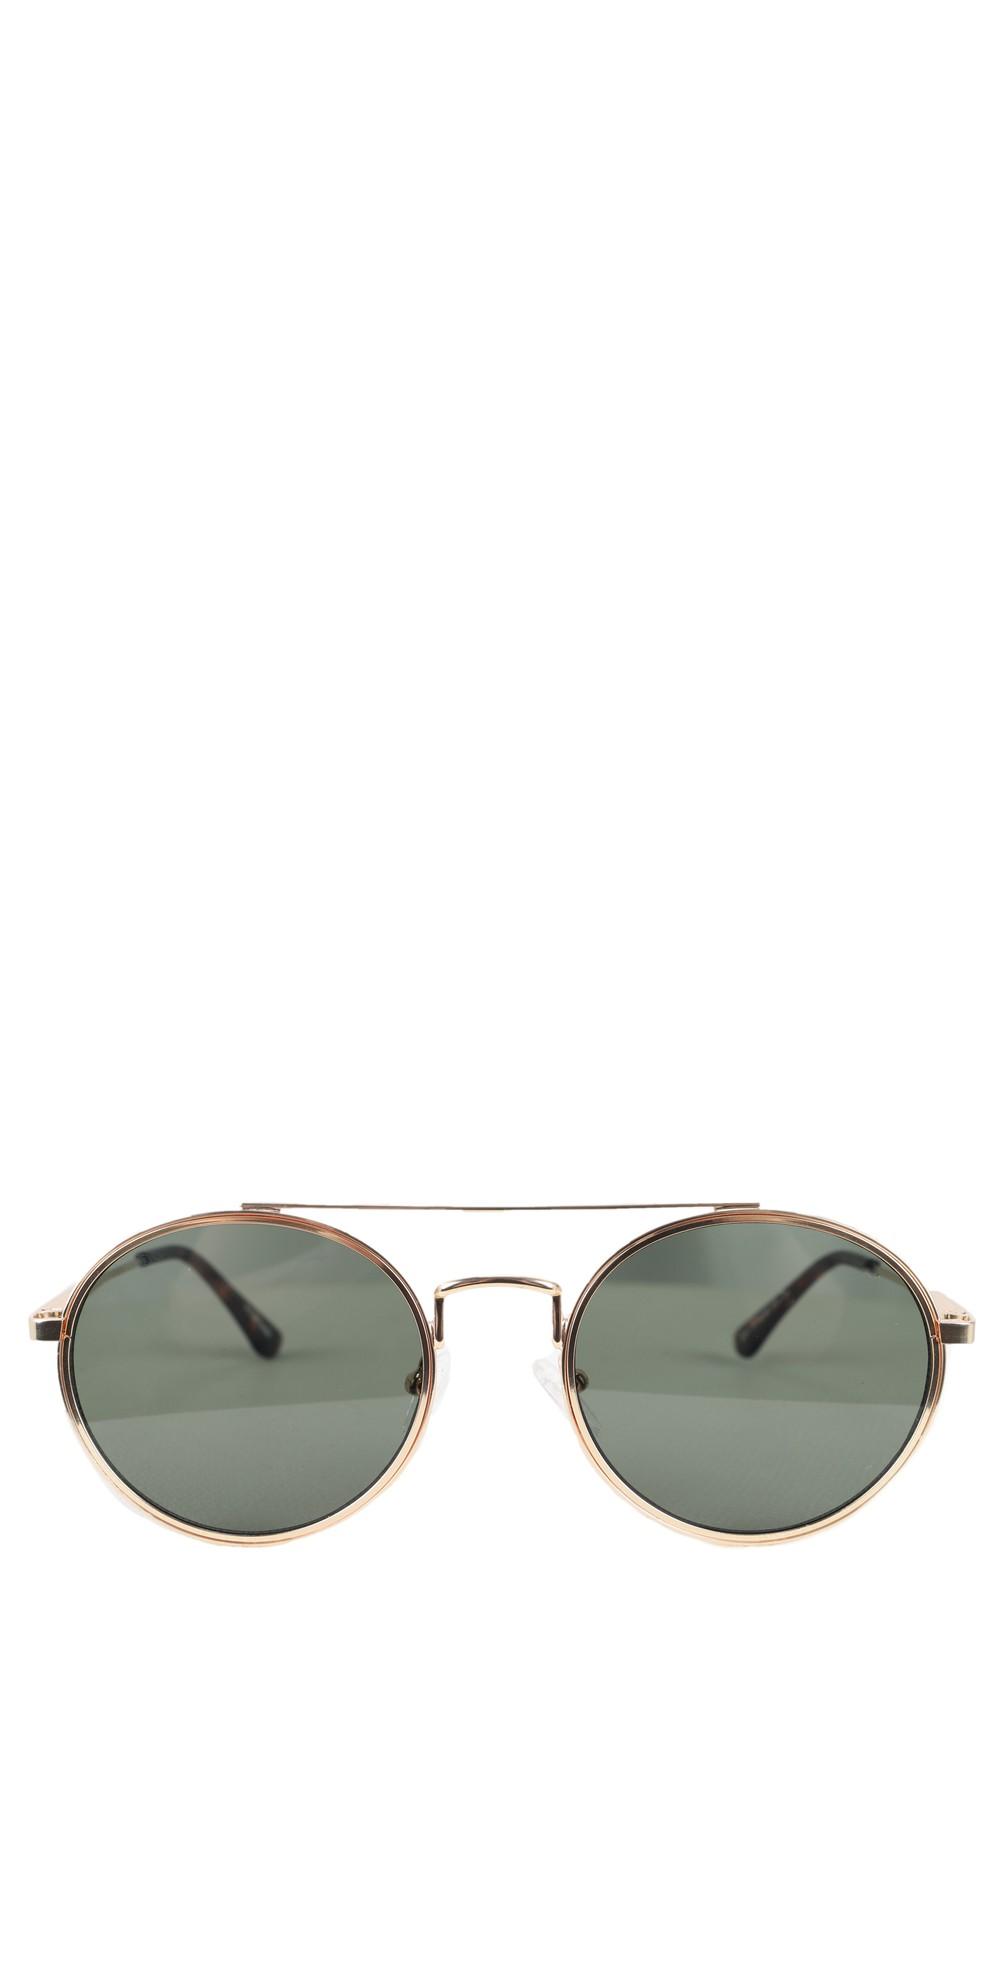 Pilot Sunglasses main image